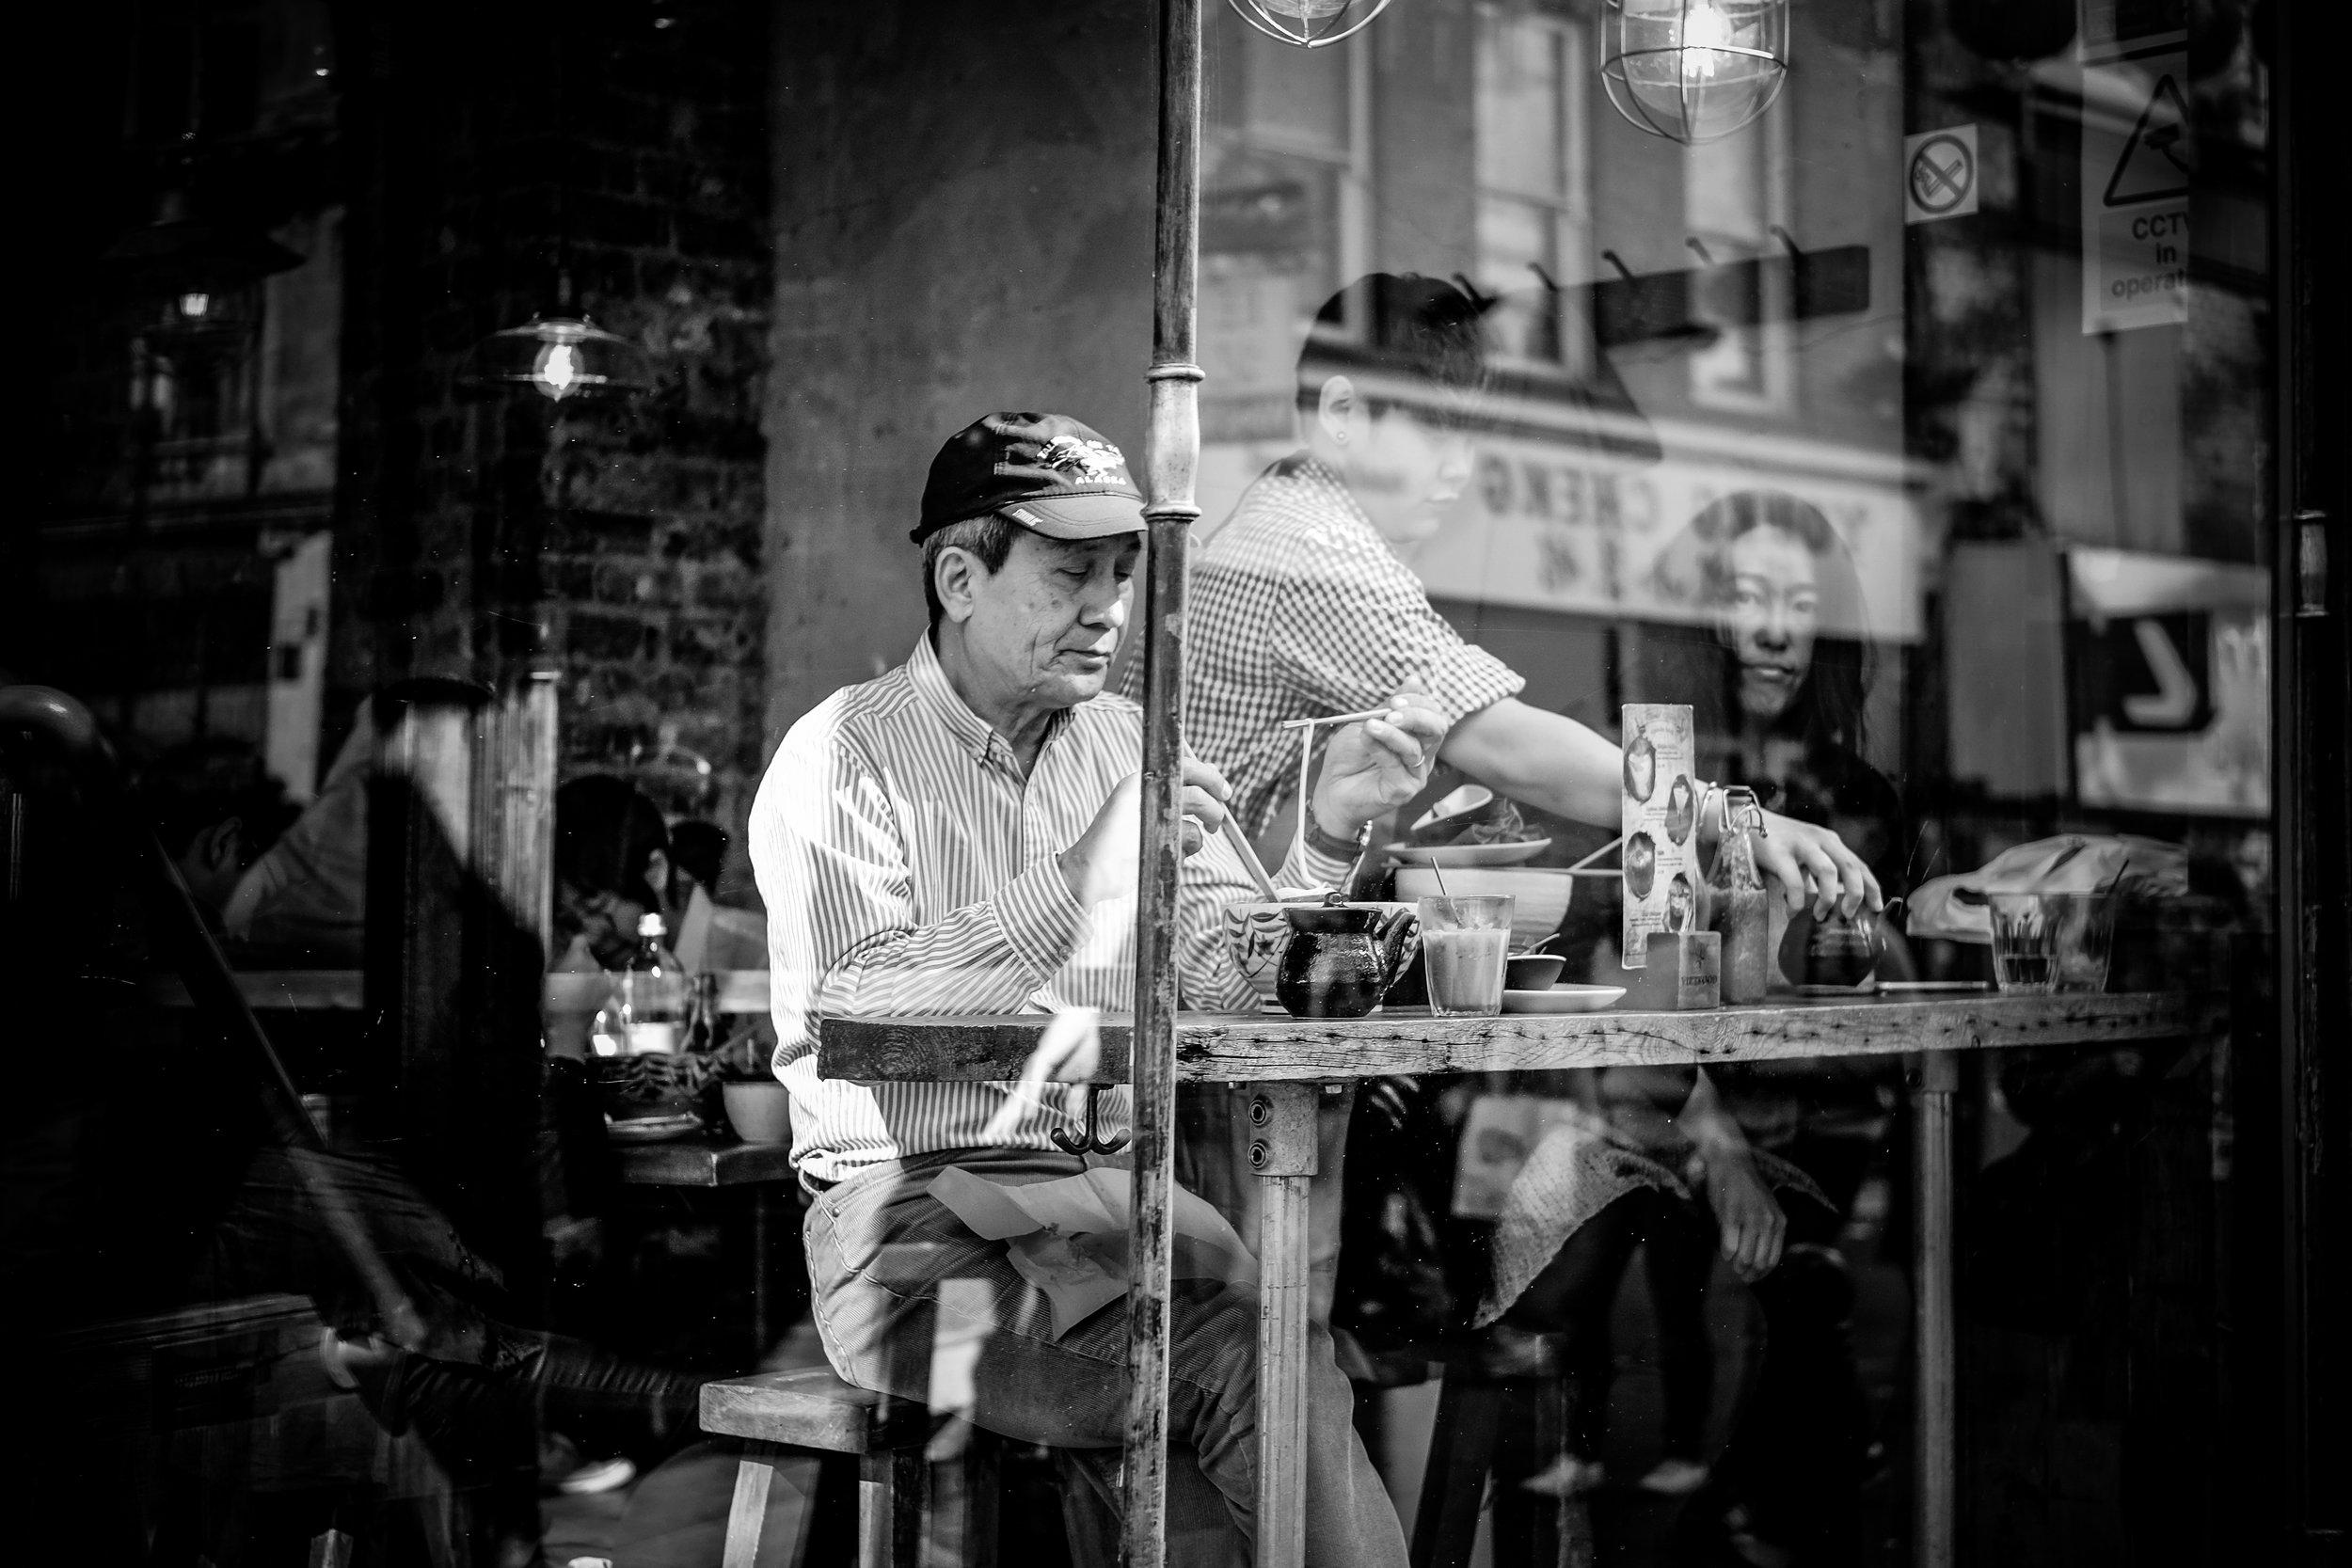 Layers & reflections on Wardour Street